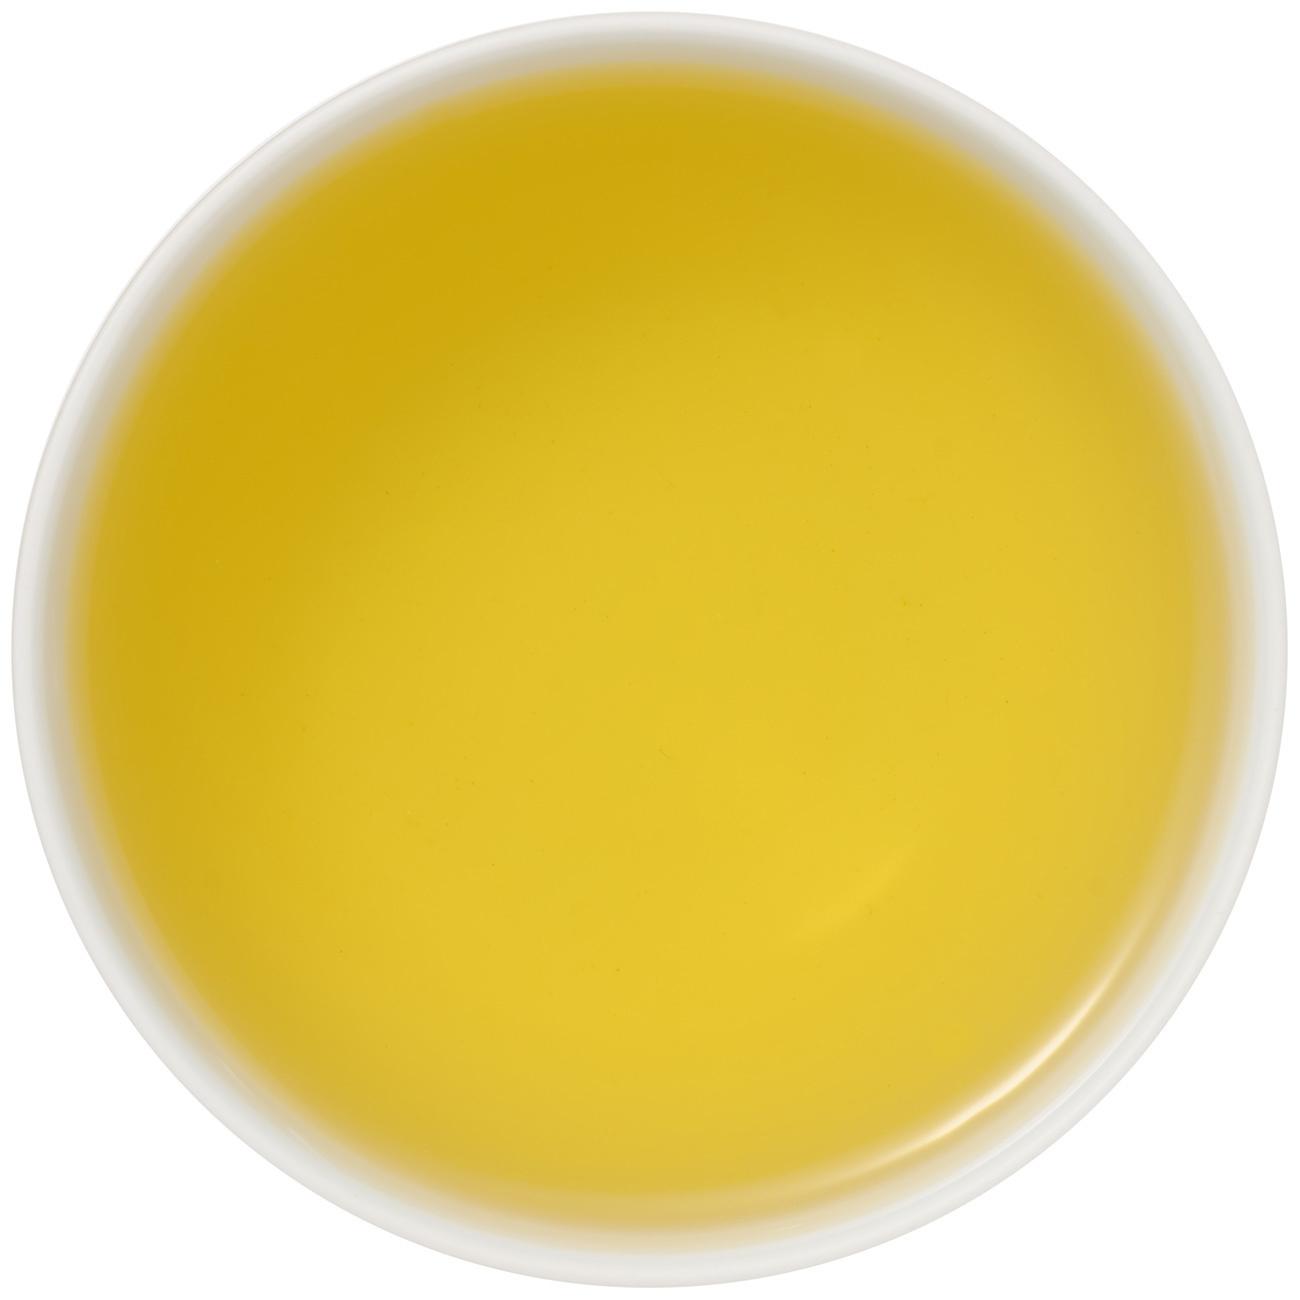 Sweet Lemon thee